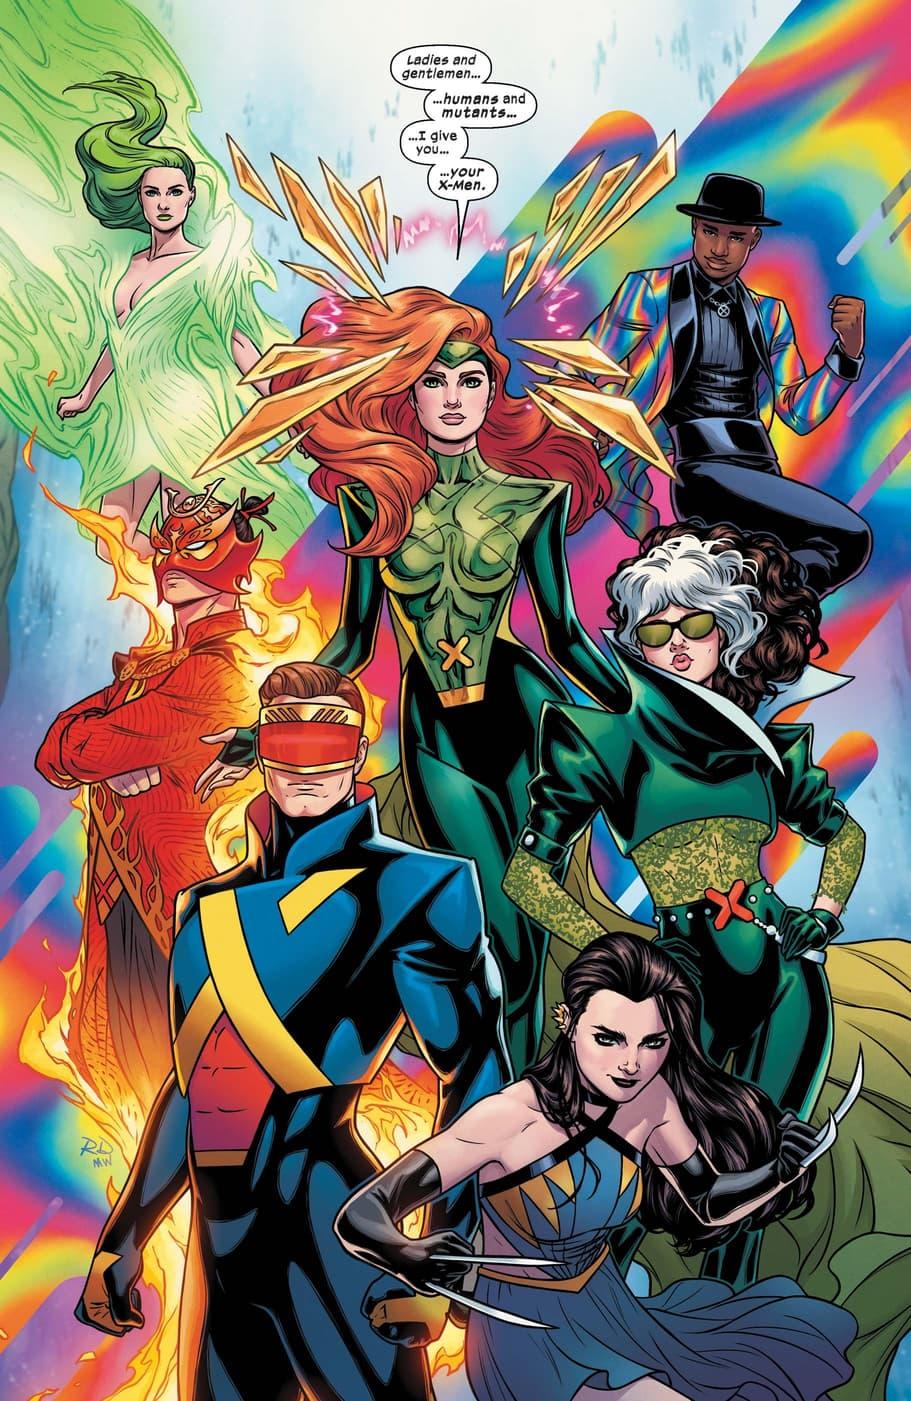 A new team of X-Men debut!